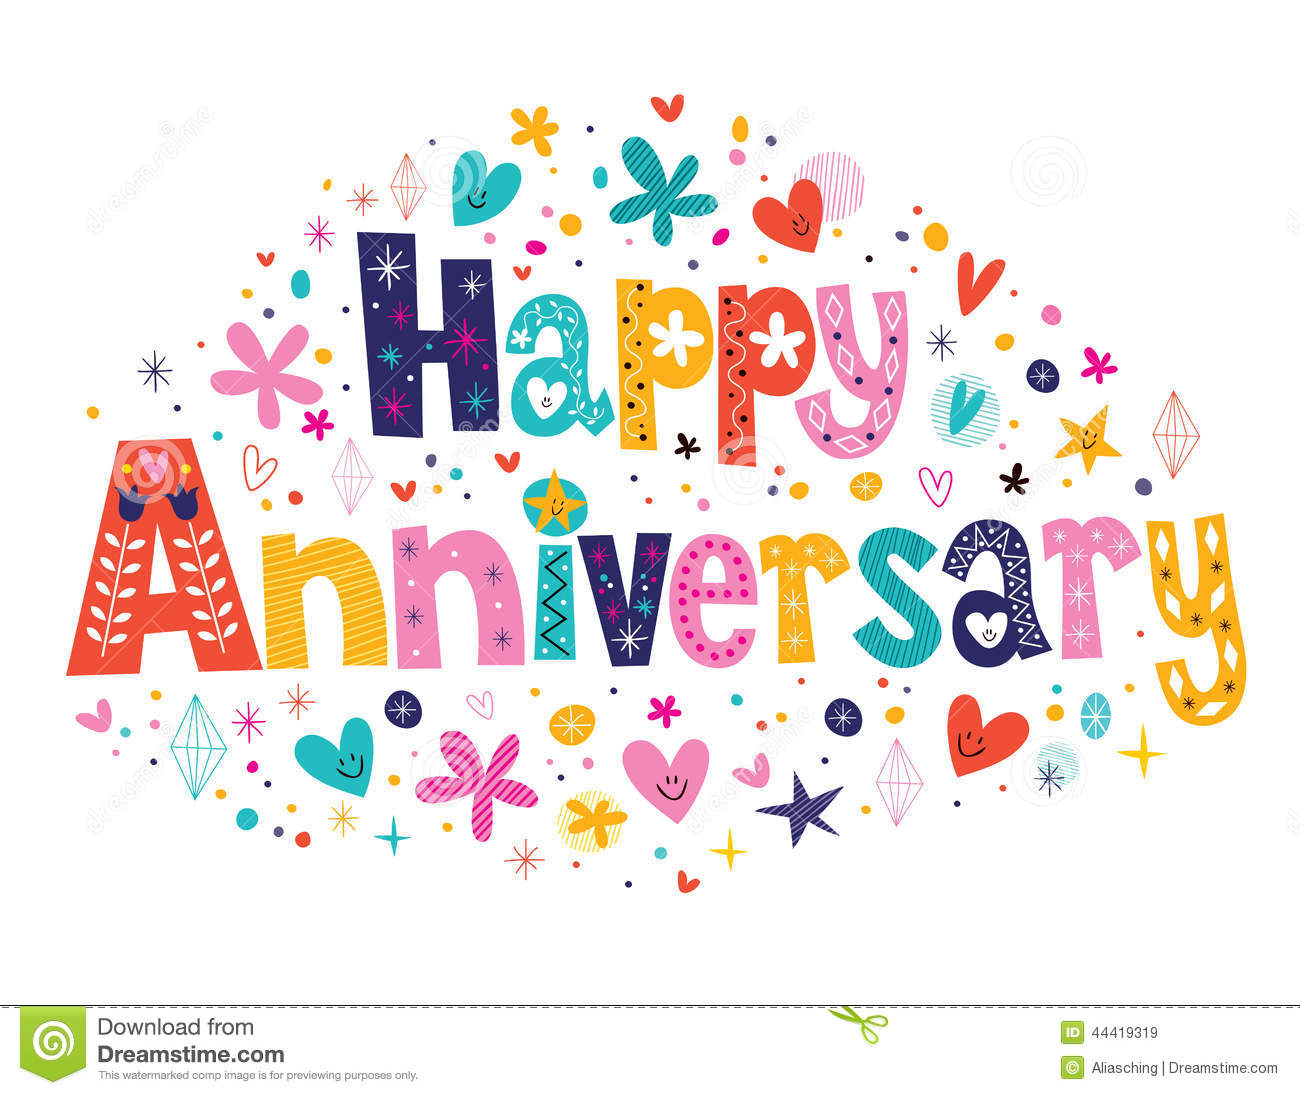 Happy Anniversary Clip Art 4. F8f049c92d-Happy anniversary clip art 4. f8f049c92d3874632d3e964ed48bf4 .-9